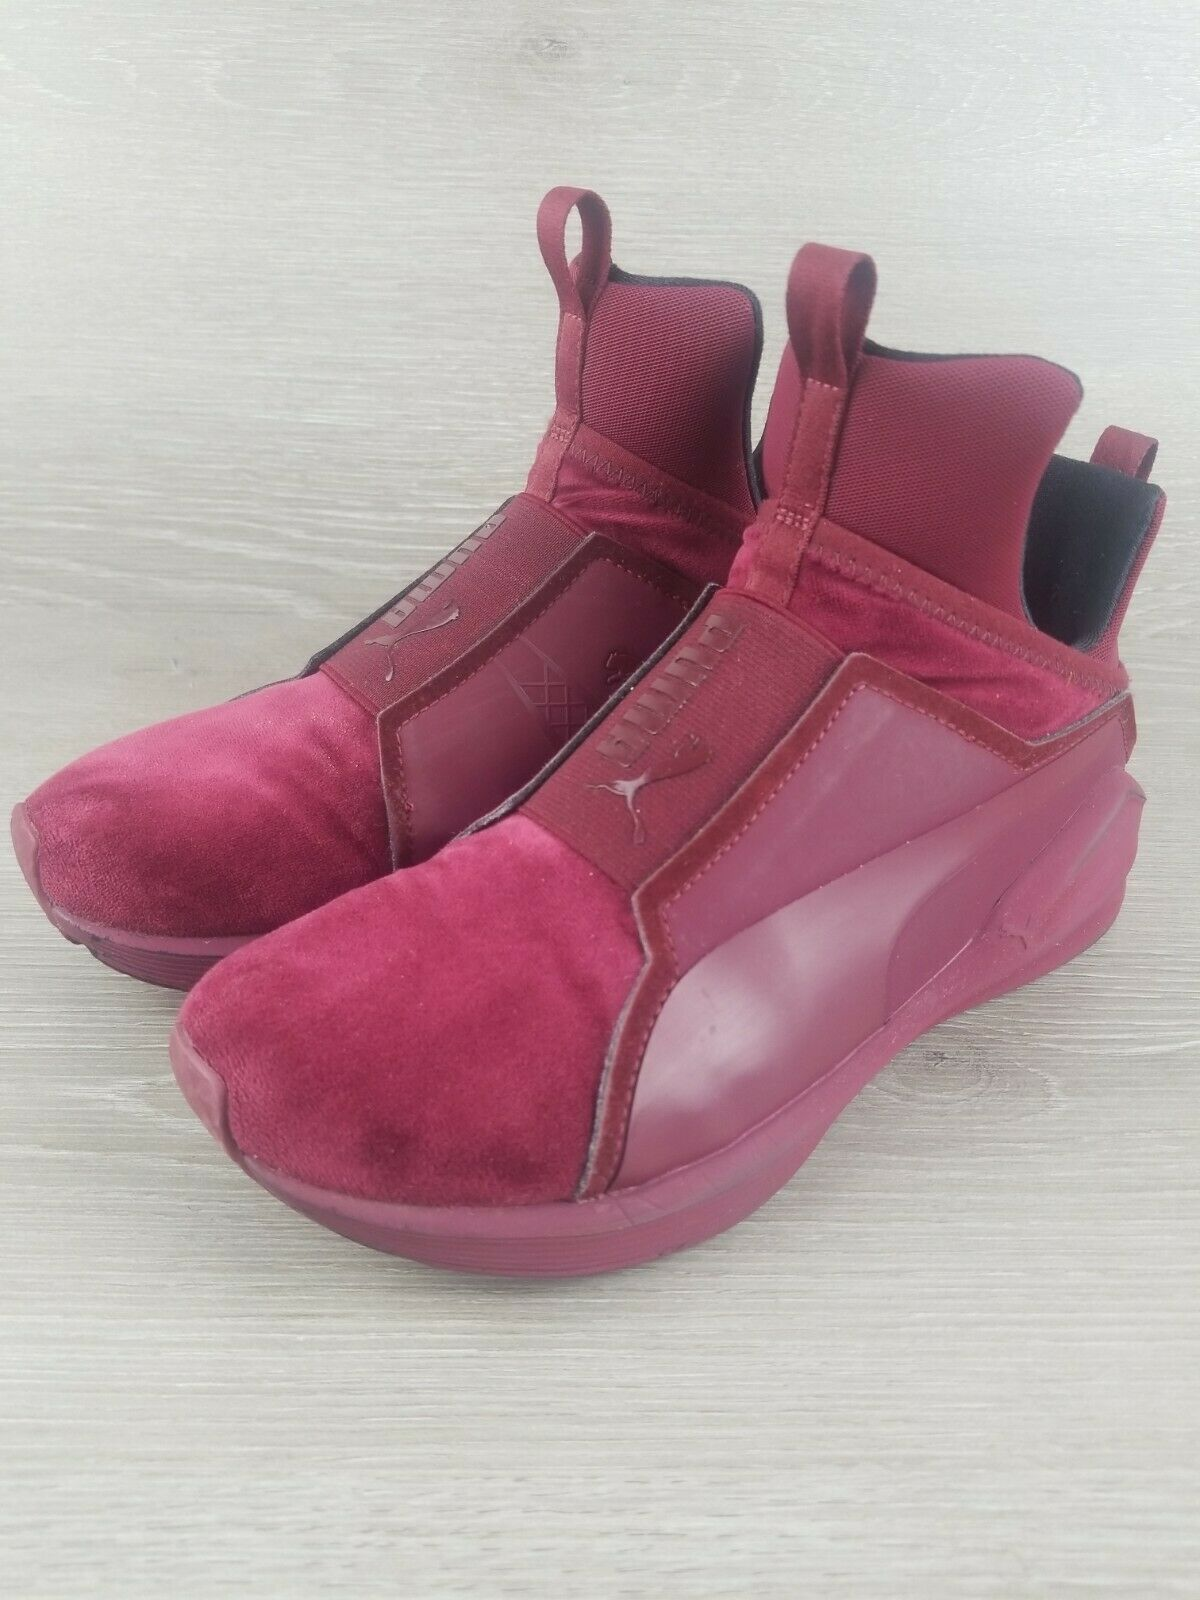 Puma Fierce Womens size7 Athletic Shoes